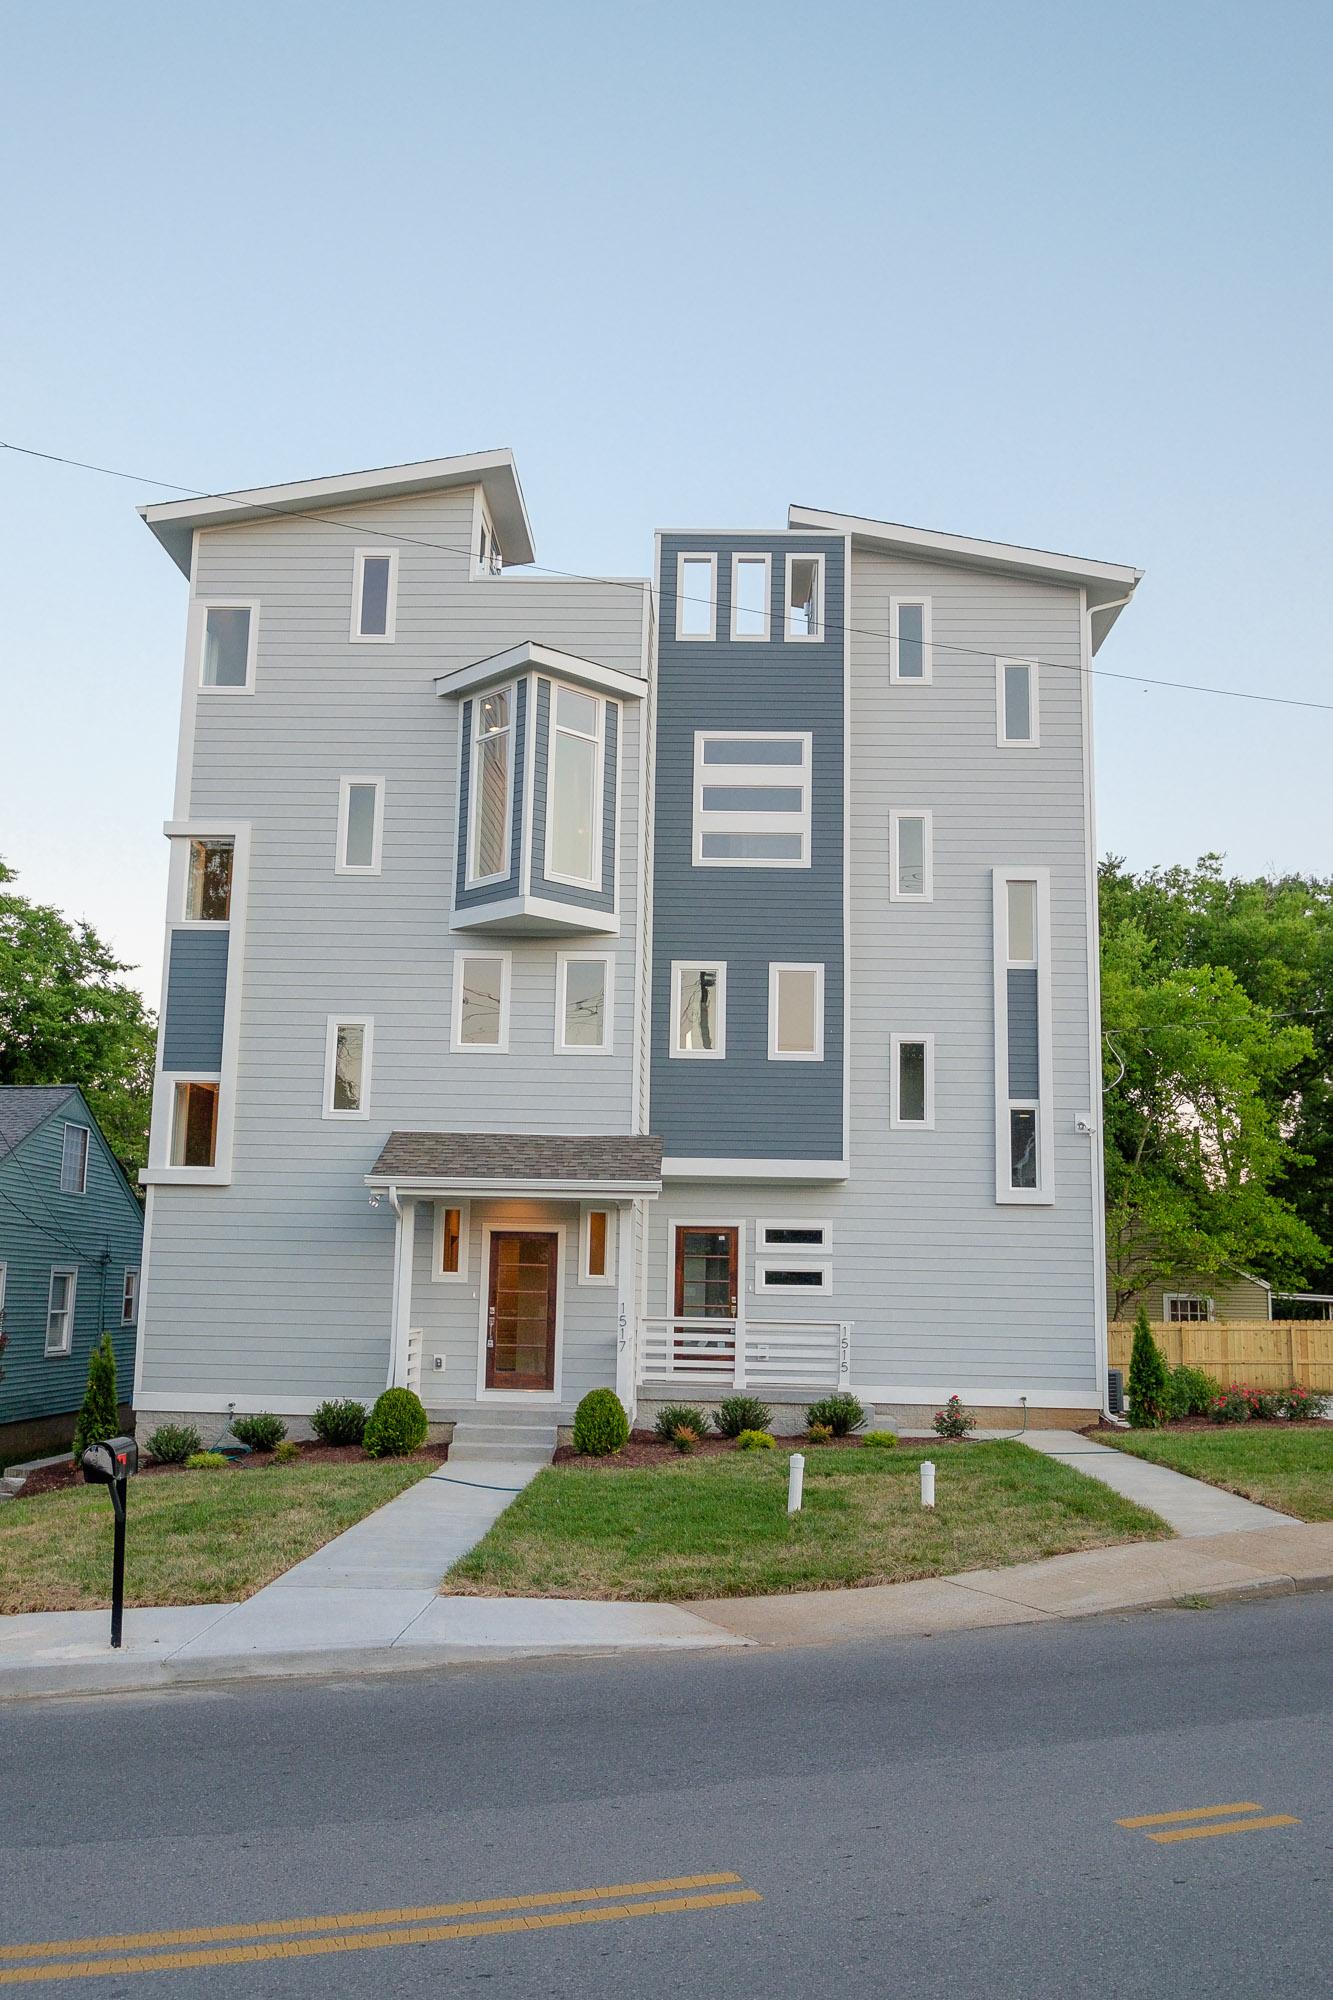 House-Plans-Online-Duplex-Nashville-Peggy-Newman-Modern-Exterior-Windows-Porter.jpg